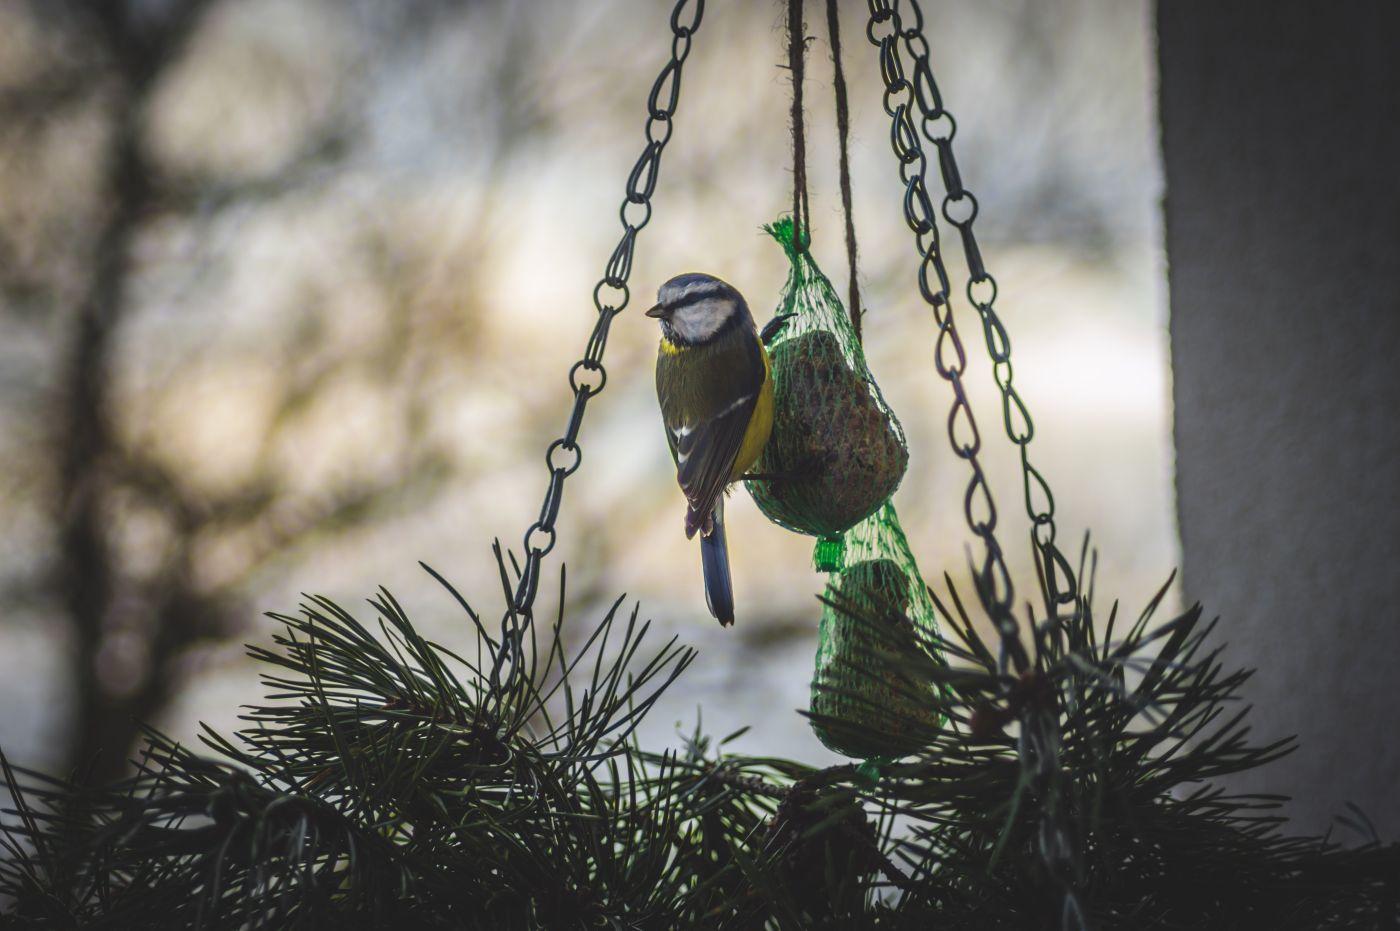 Koule Ptak Sitky Krmeni Zima